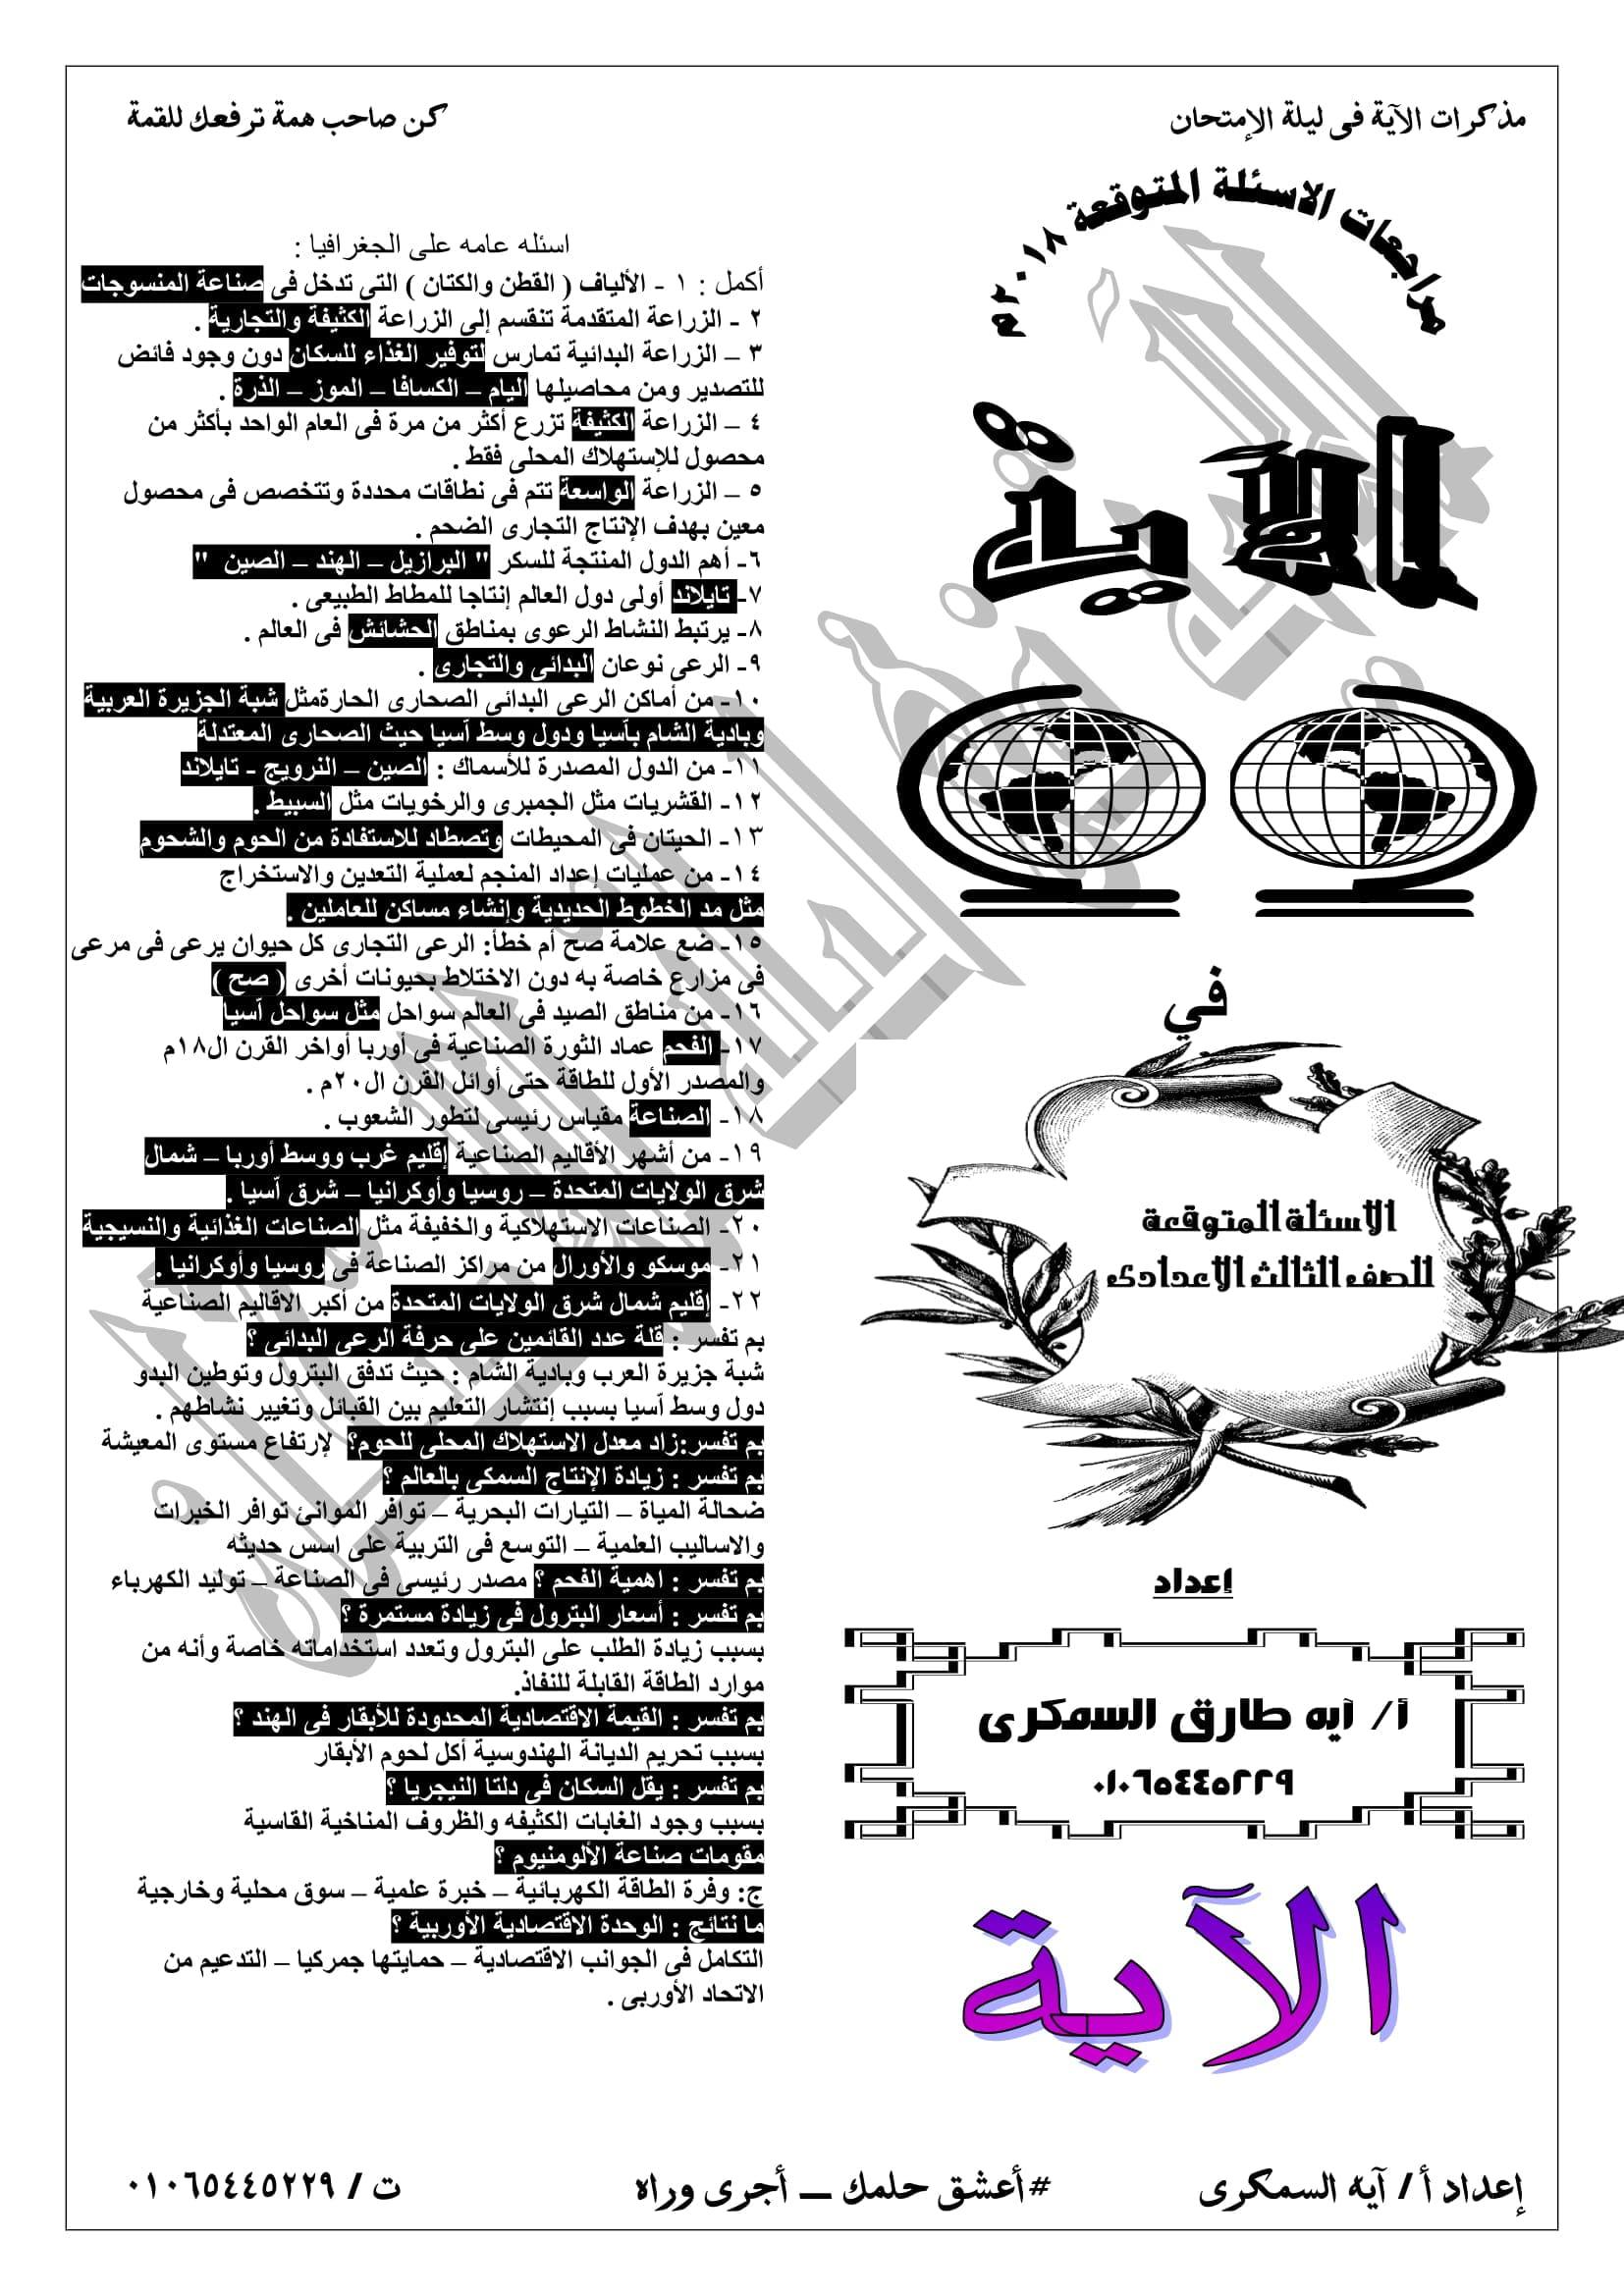 exam-eg.com_152458023198951.jpg